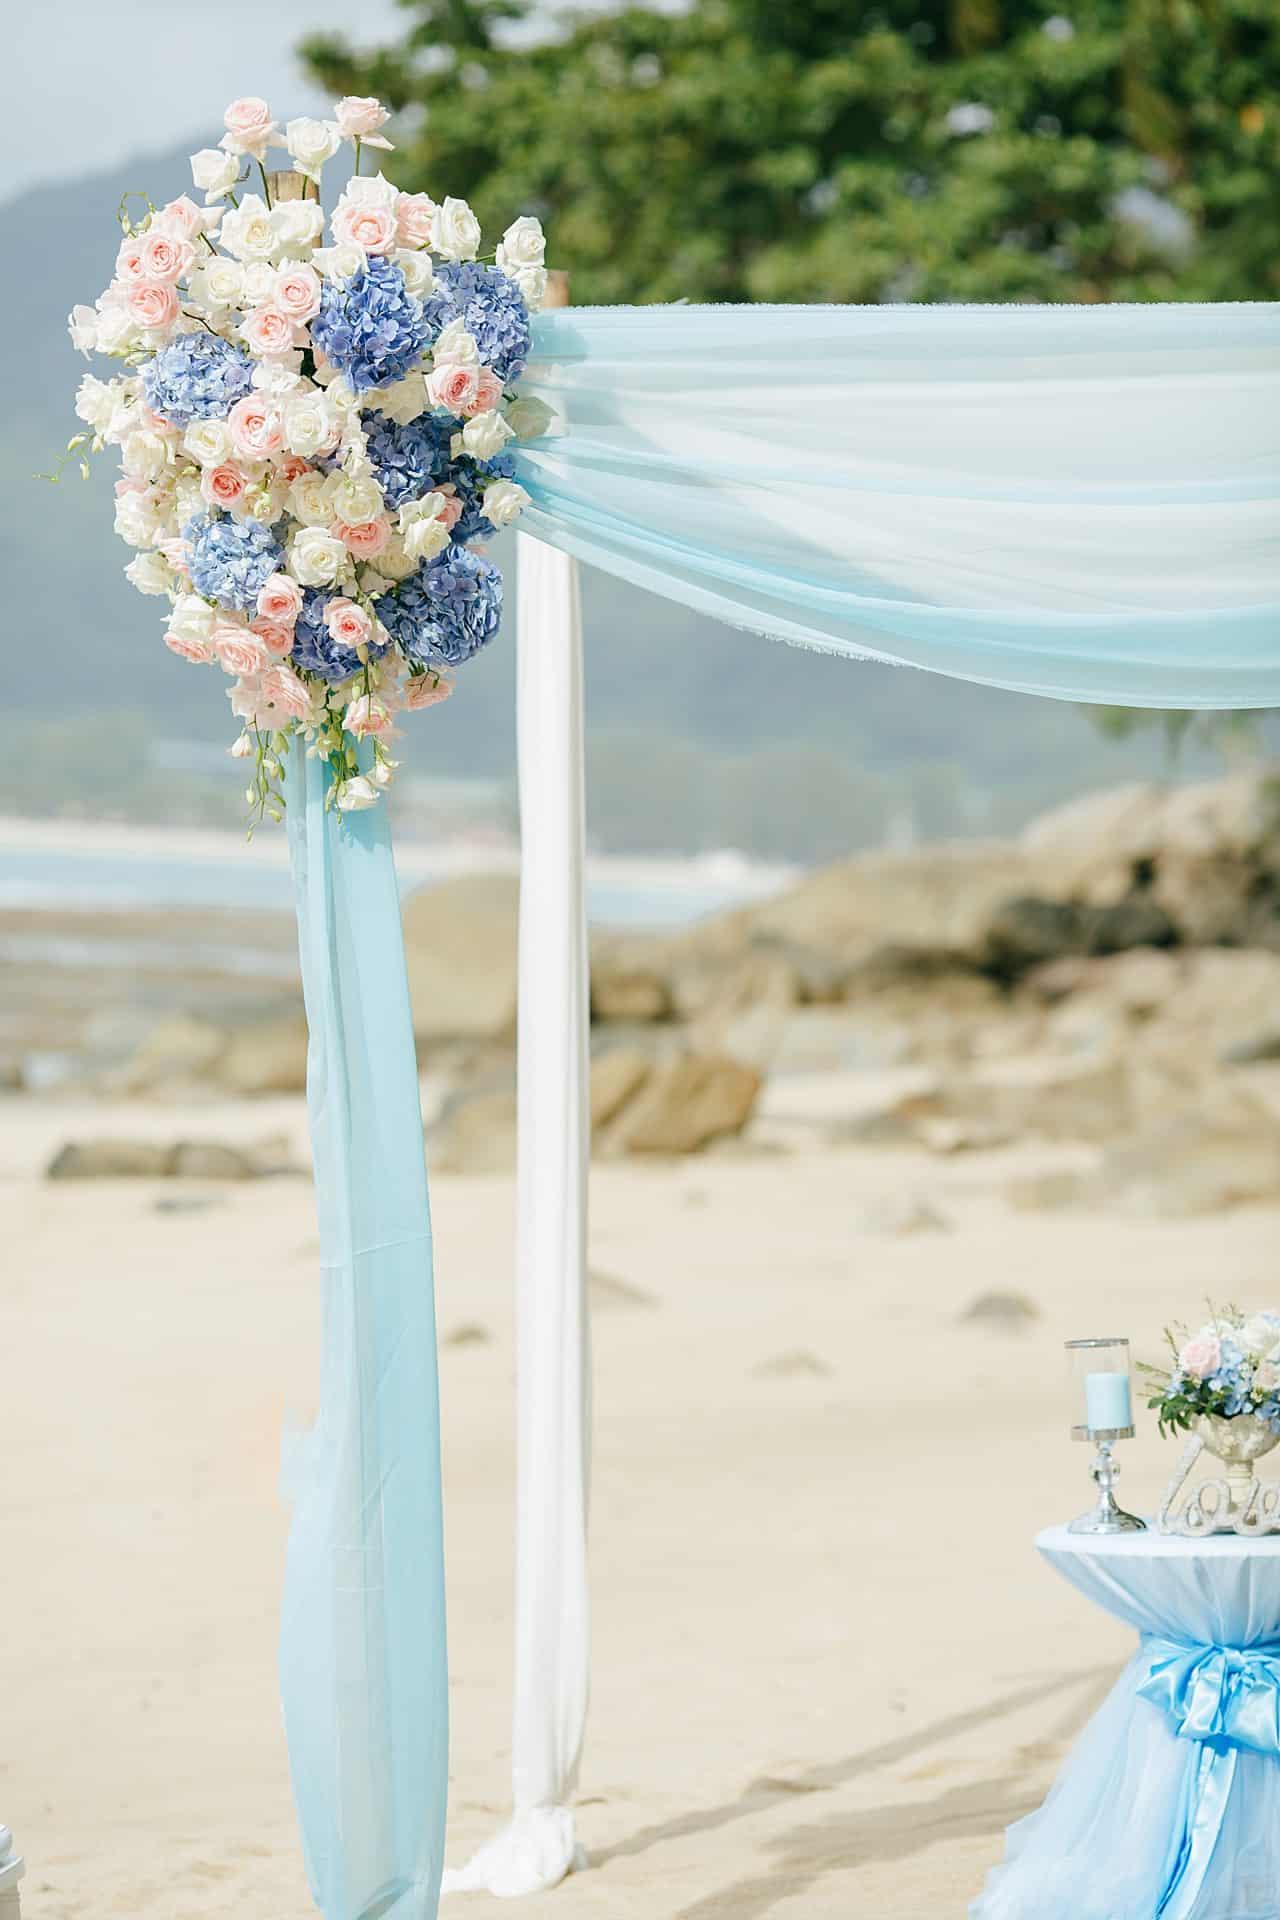 Wedding Haruka & Ronny, Hua Beach 8th September 2018 260